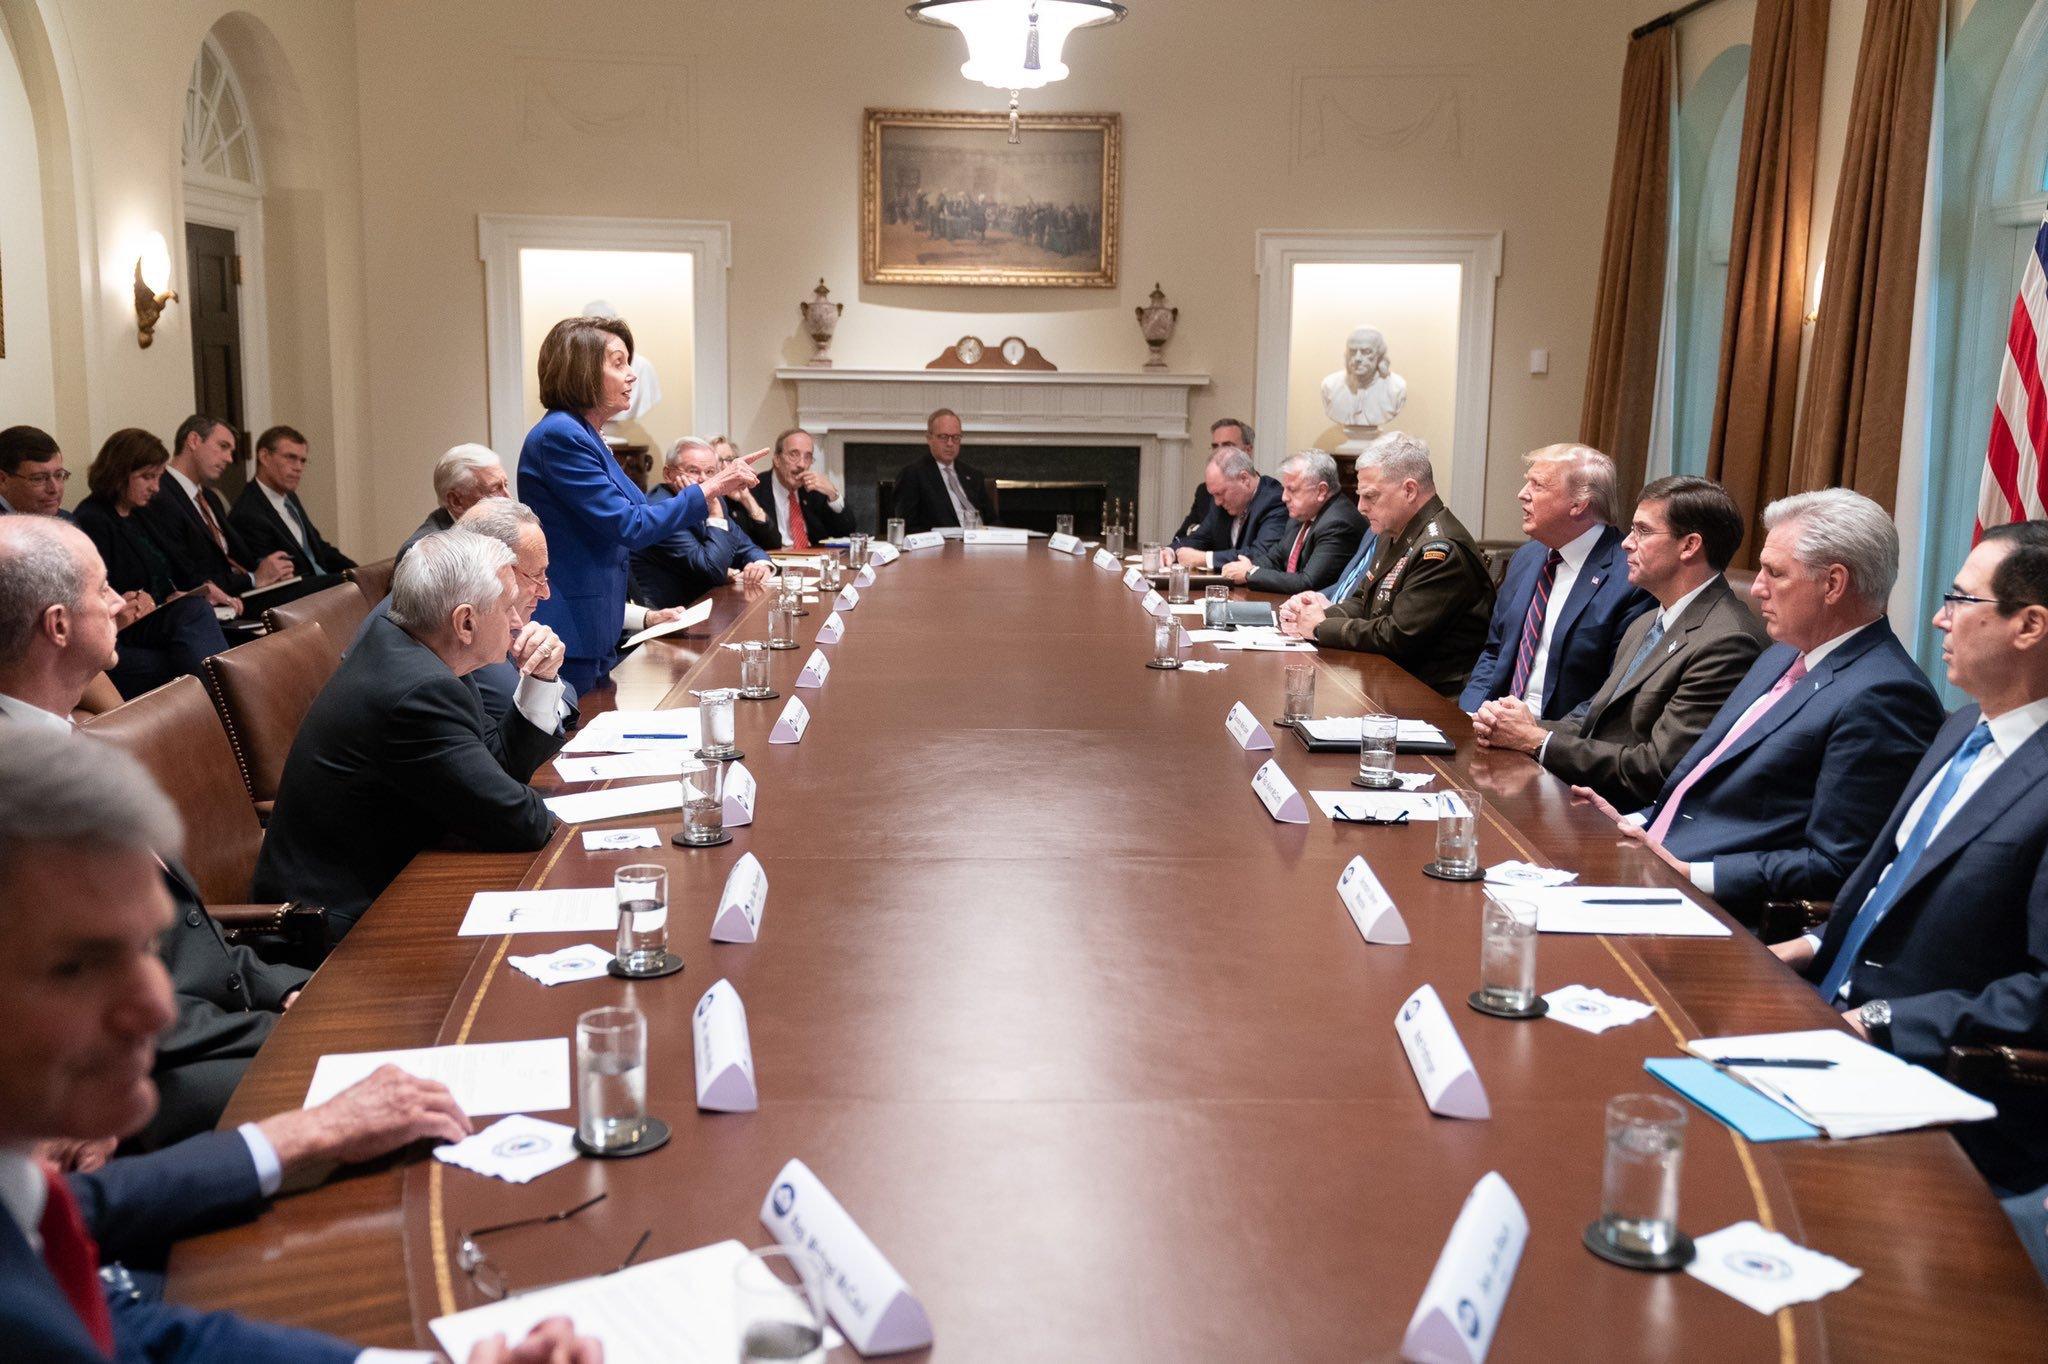 Nancy Pelosi confronts Donald Trump